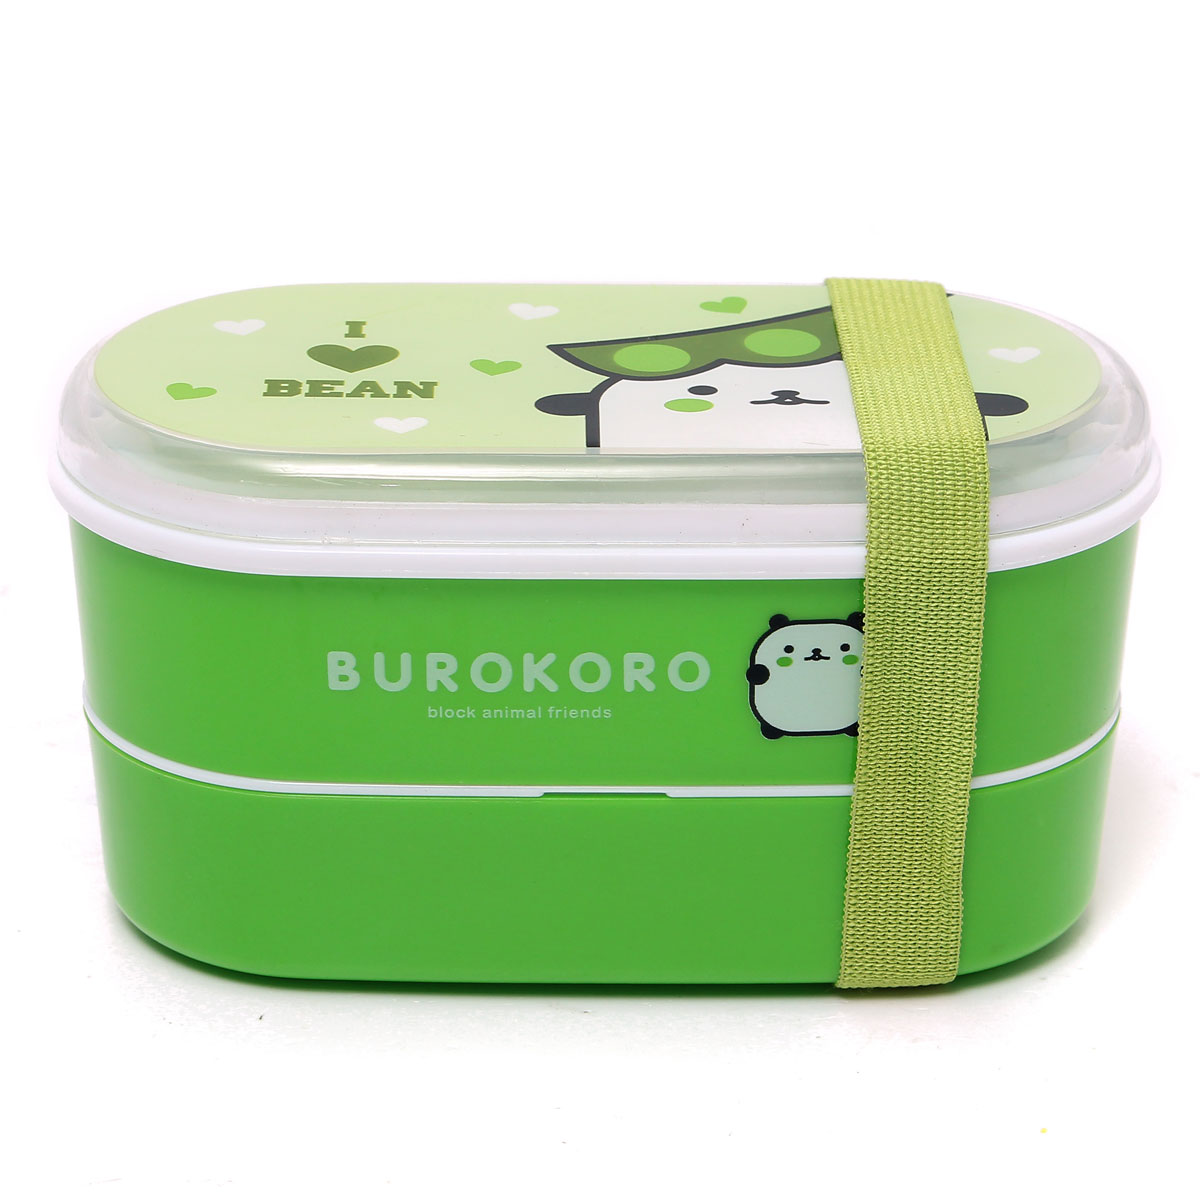 student cartoon lunch box food container storage portable bento box chopsticks green lazada. Black Bedroom Furniture Sets. Home Design Ideas